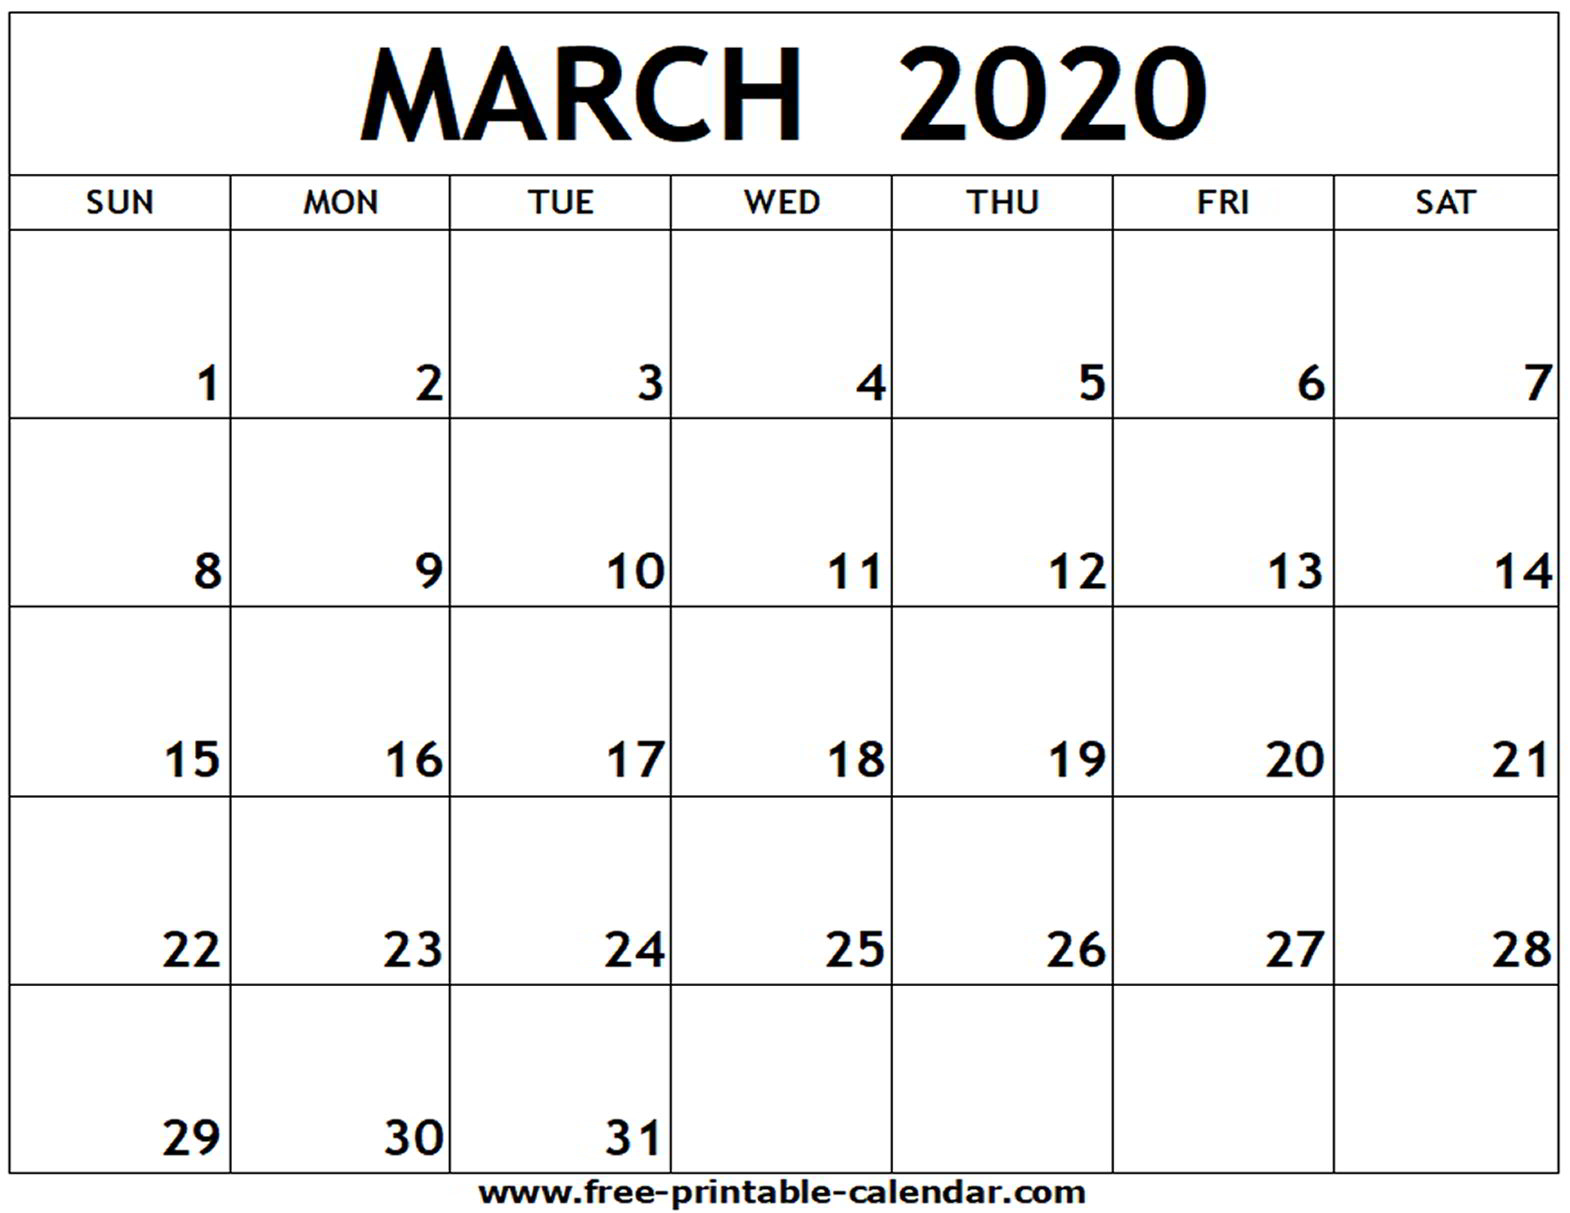 March 2020 Printable Calendar - Free-Printable-Calendar for 2020 Calendar Free Printable